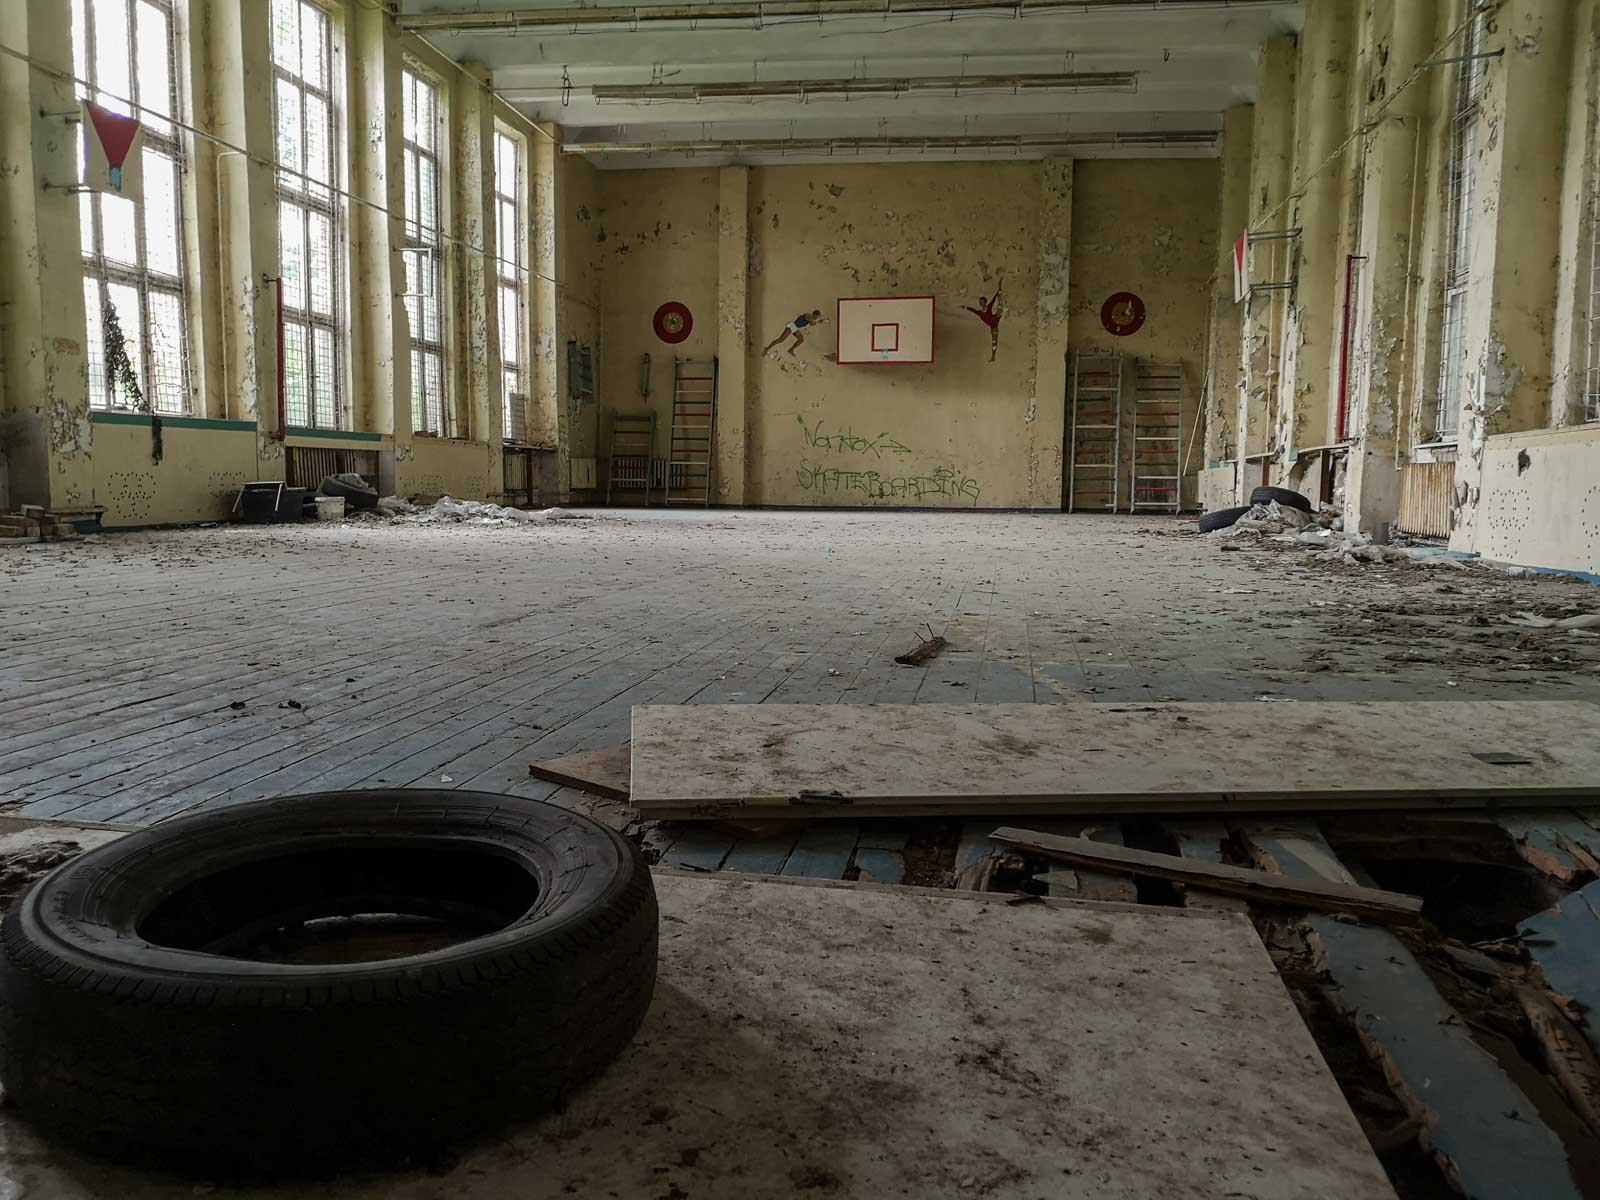 Sporthalle verlassene sowjetische Schule